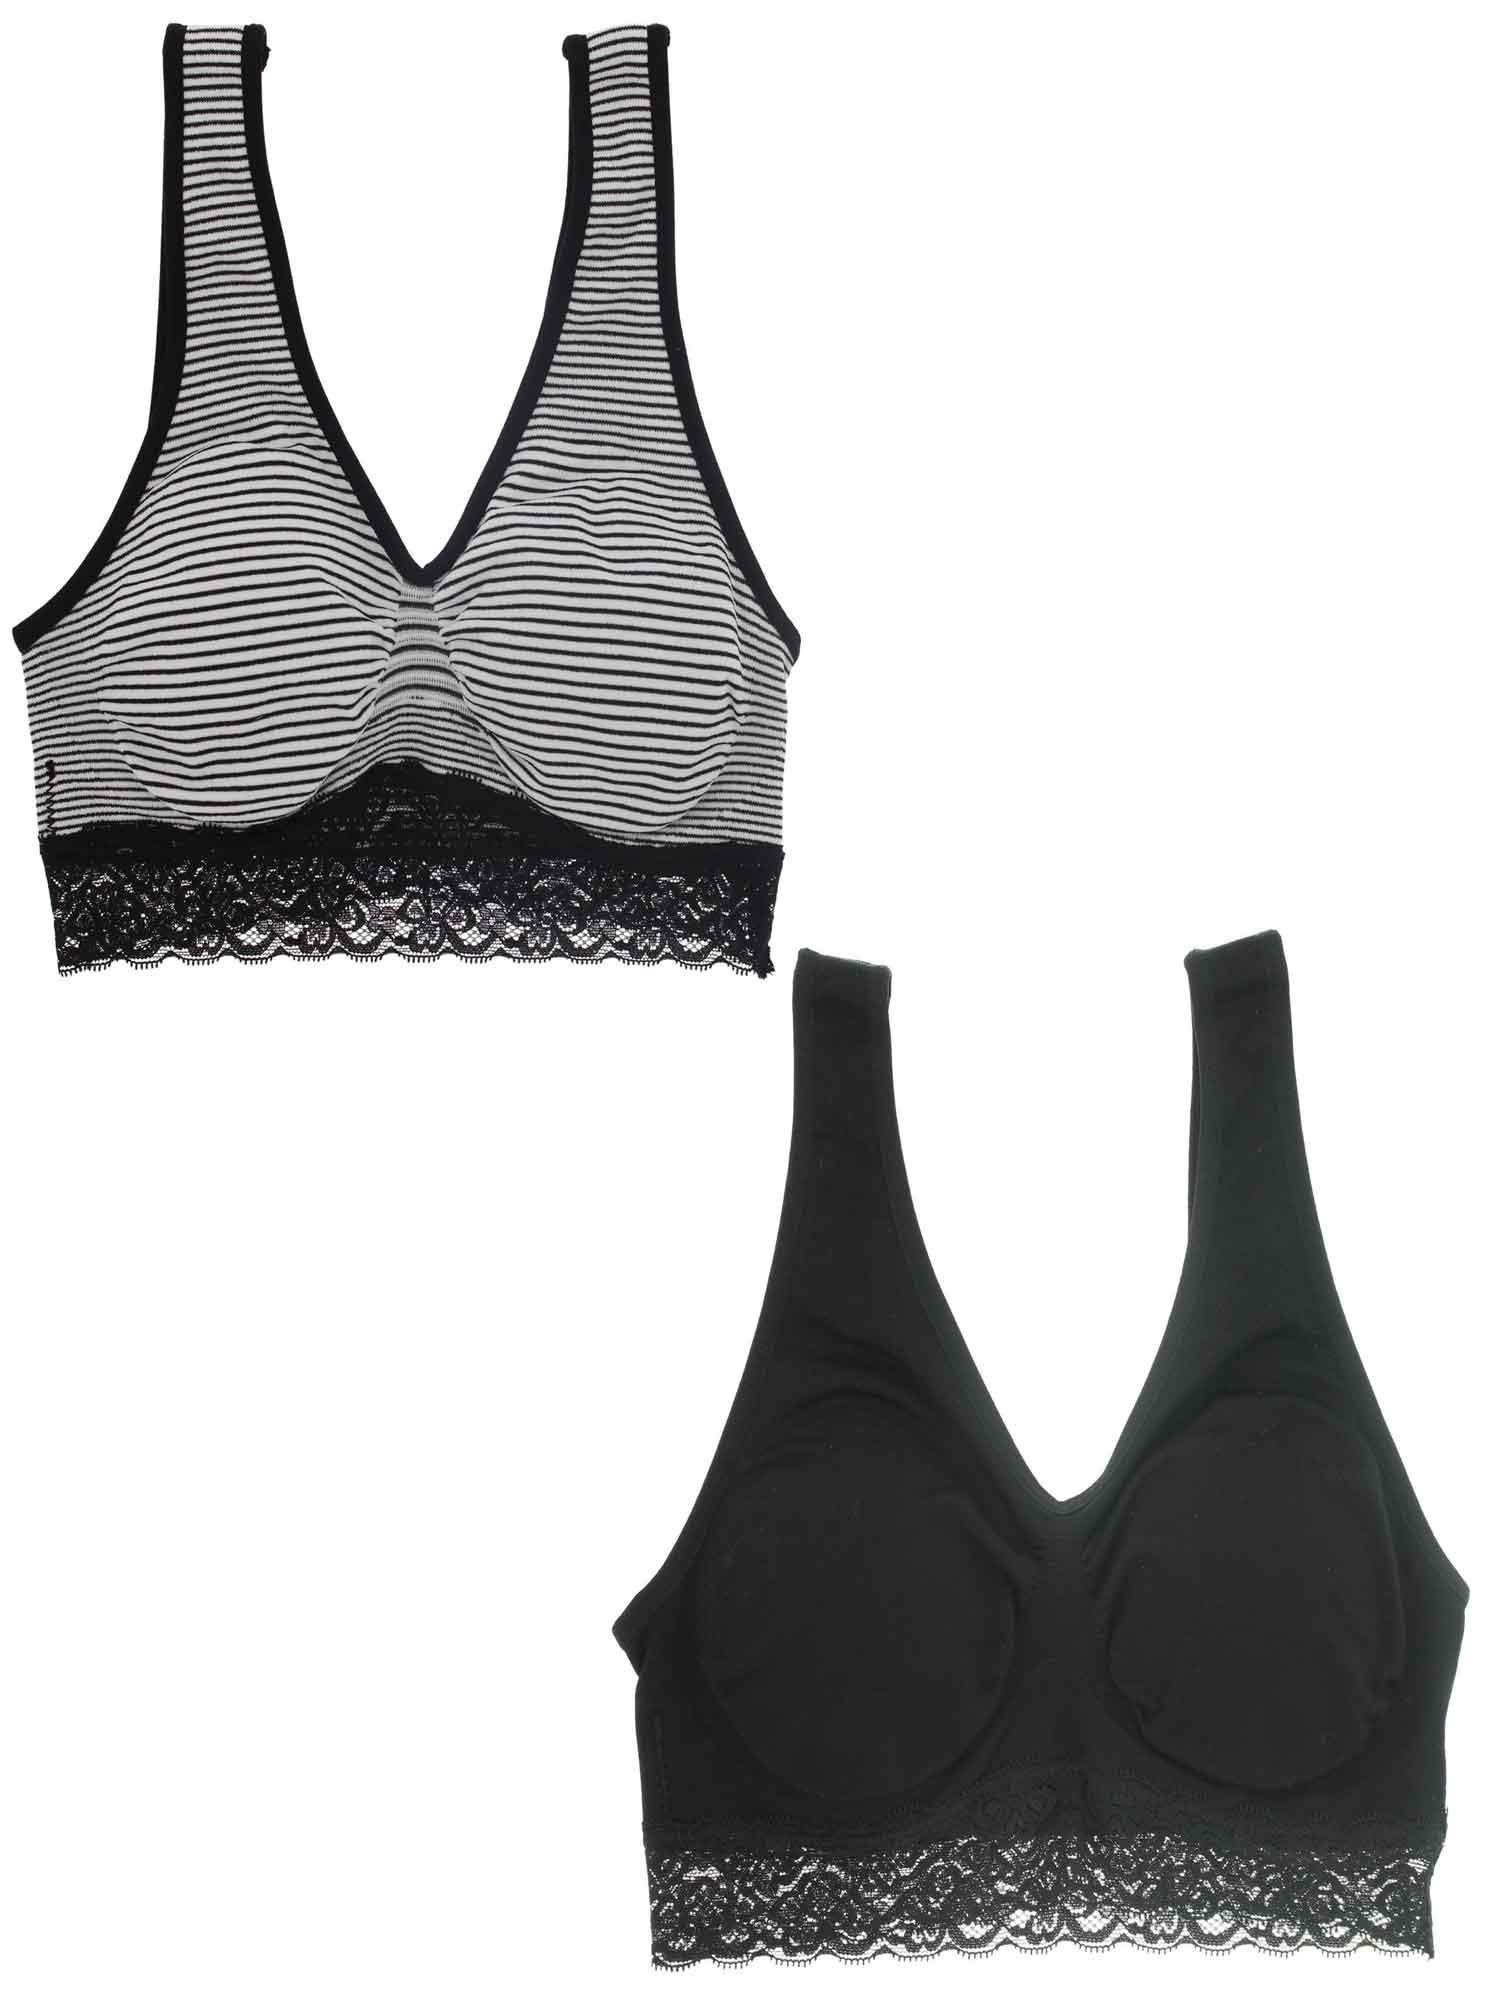 f05dc42d18 Marilyn Monroe Intimates - Marilyn Monroe Intimates Women s Seamless  Striped Comfort Bra (Small